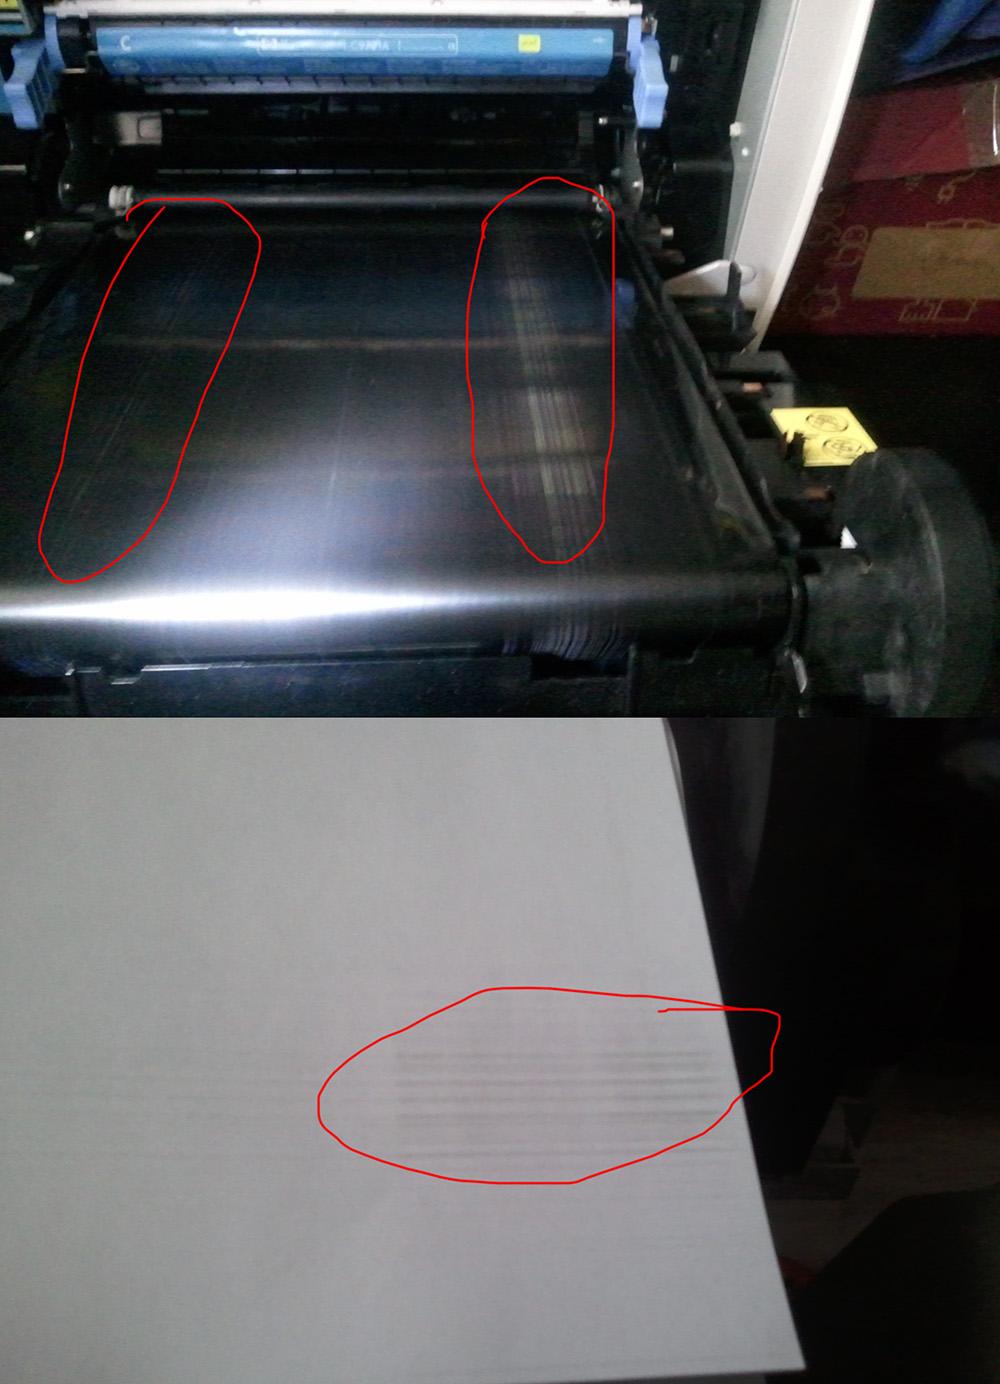 HP 4650 dtn - brudzi wydruki - pionowe cienkie paski